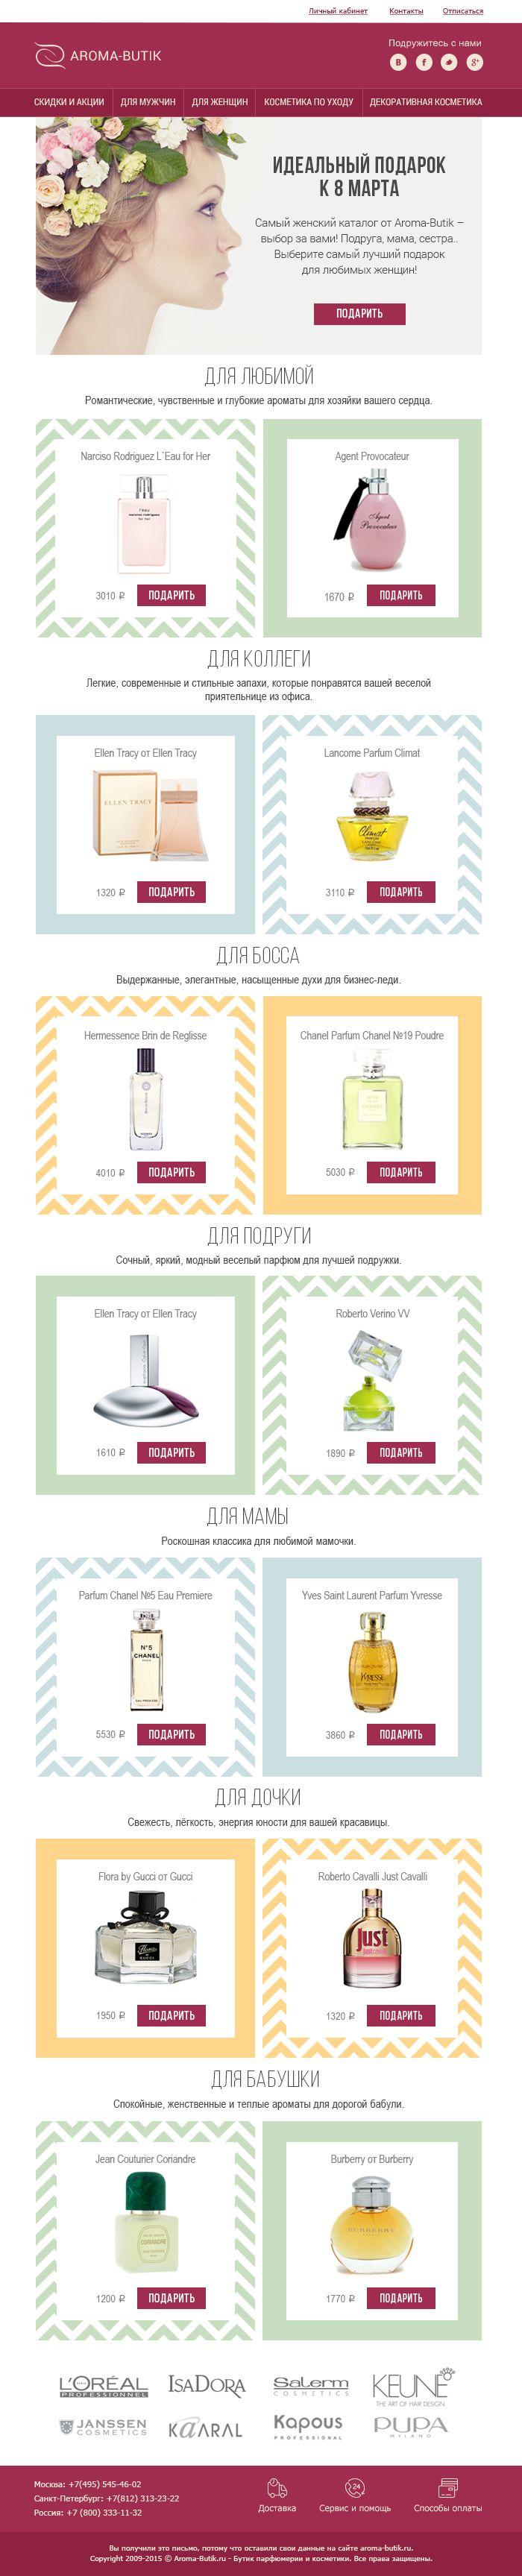 AROMABUTIK: Presents guide on Women's day. Help our subscribers to choose the only one. // АРОМАБУТИК: Гид по подаркам на 8 Марта. Помогаем подписчикам с выбором. #EMAILMATRIX #emailmarketing #promoemail